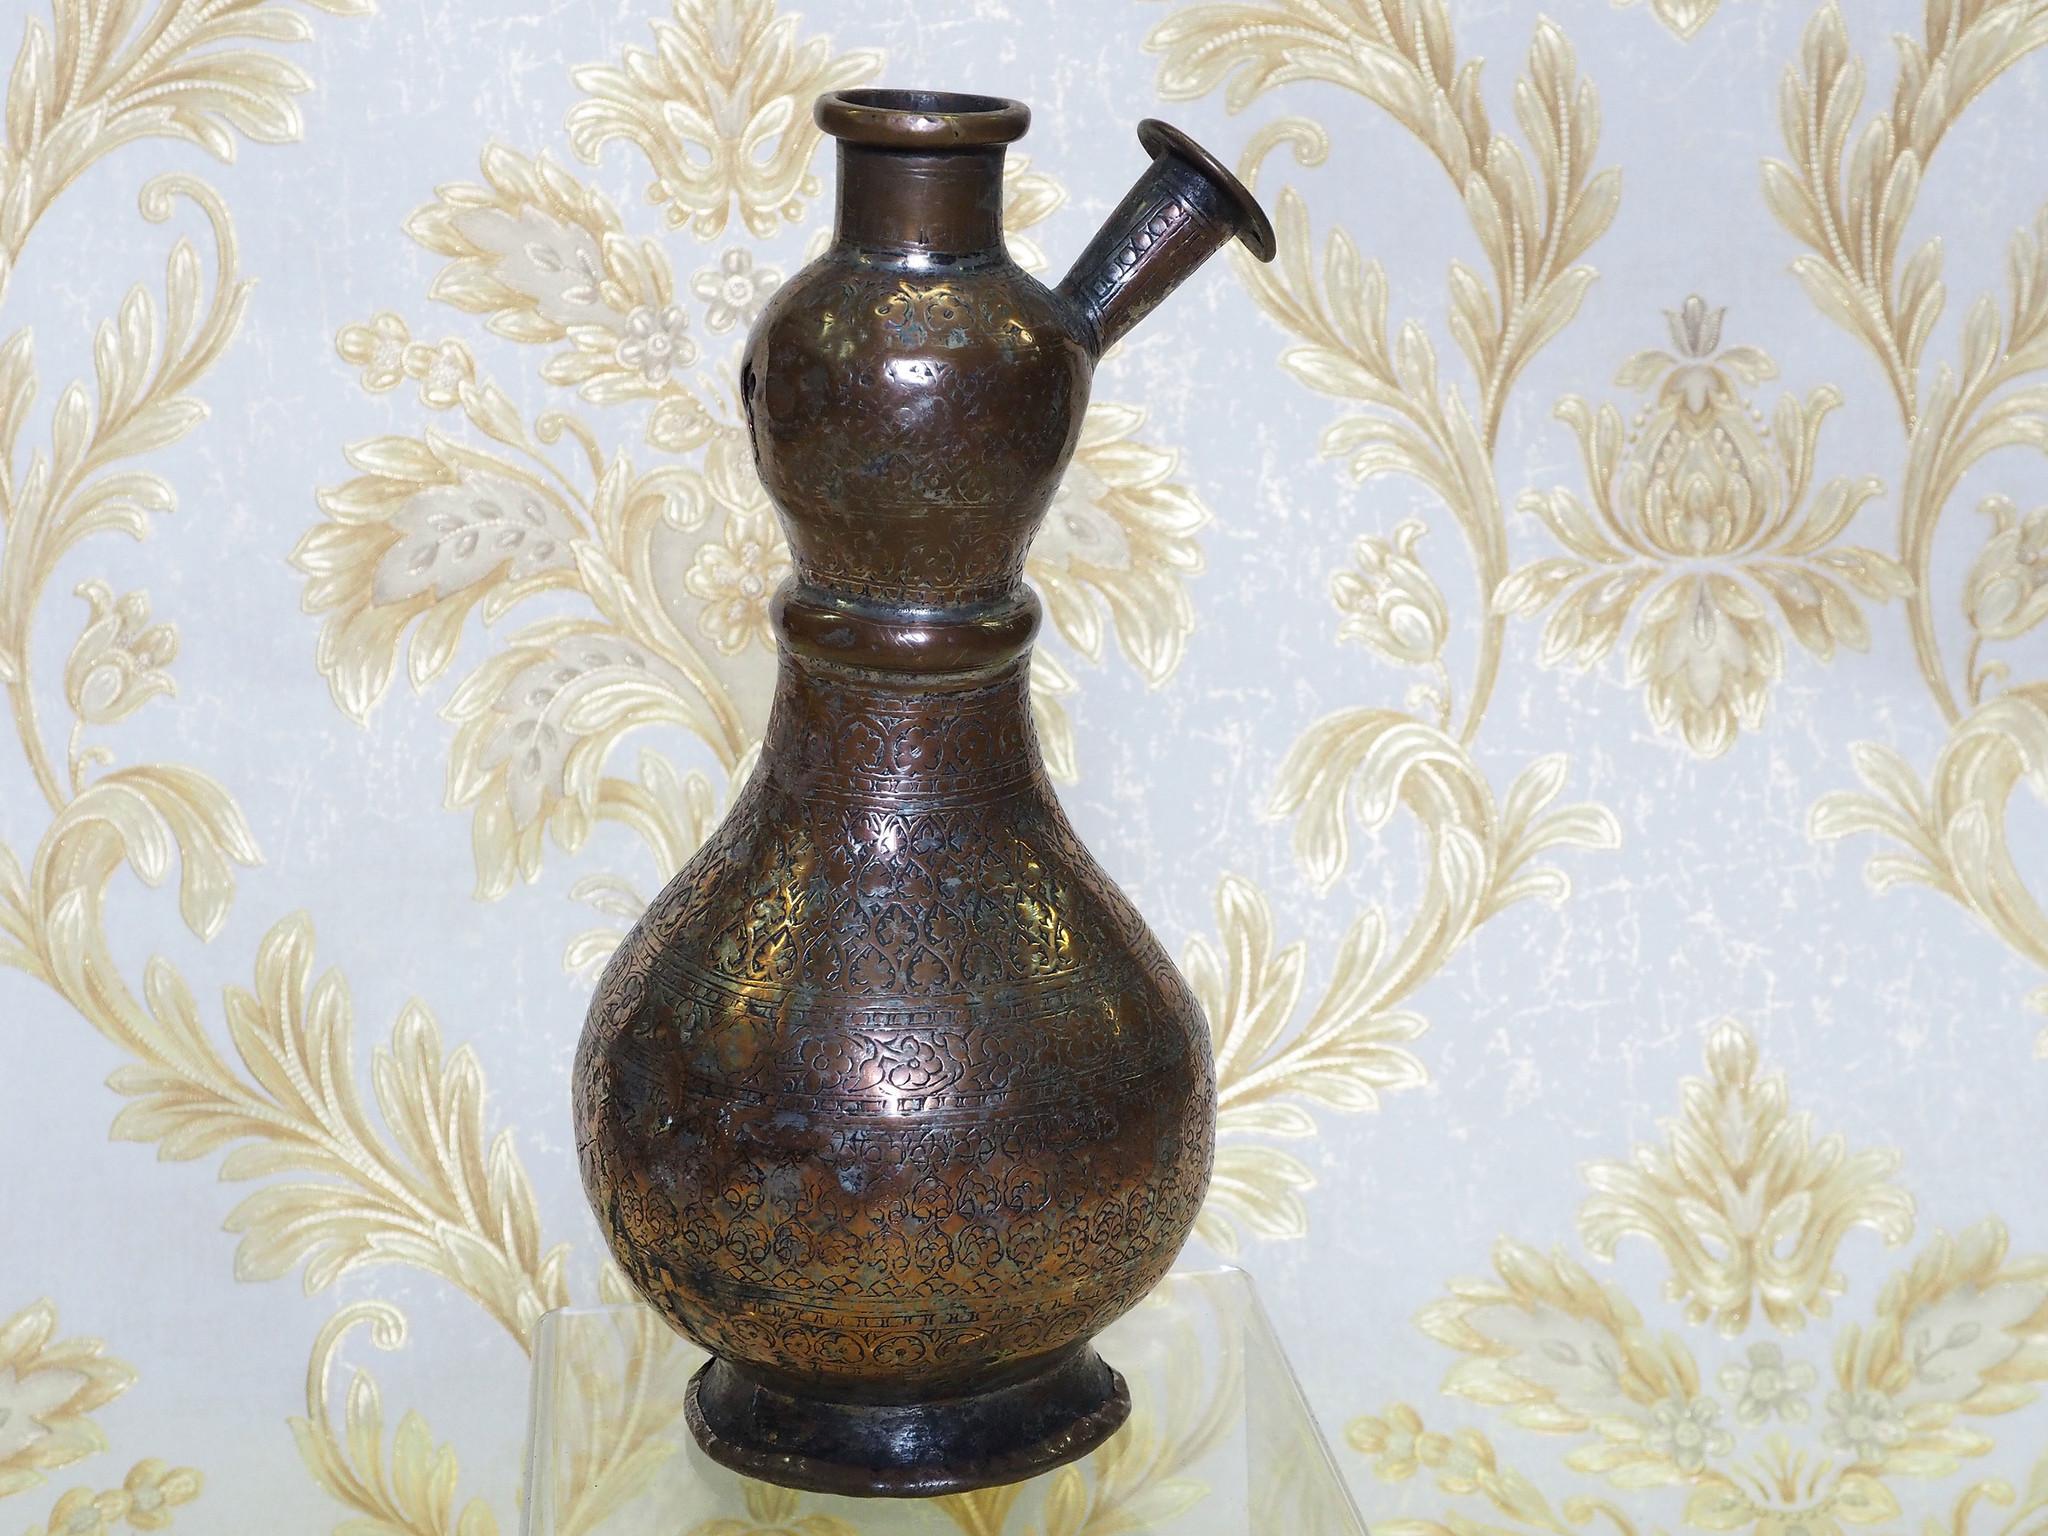 antik Massiv islamische Kupfer mini hand Wasserpfeife shisha Hookahs Schischa nargile Kalian aus Afghanistan Nr:19/6